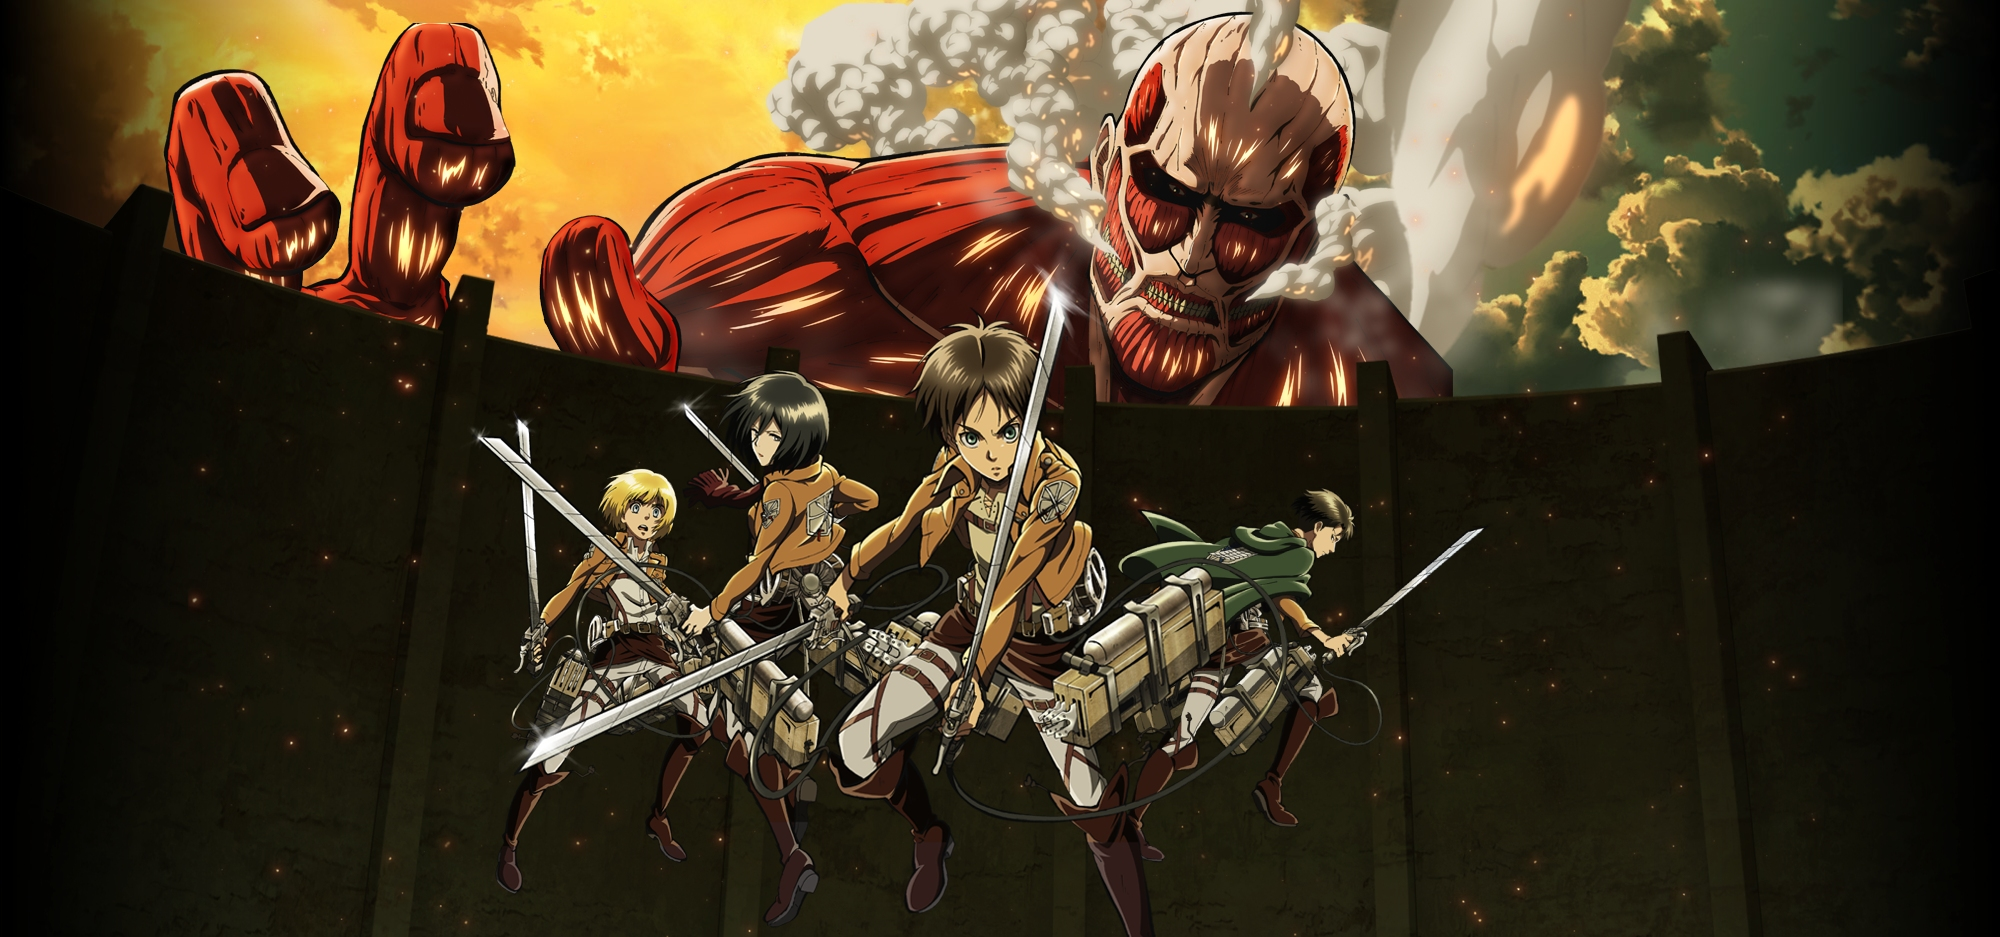 Armin Arlert Colossal Titan Eren Yeager Levi Ackerman Mikasa Ackerman Wallpaper Resolution 2000x937 Id 1004276 Wallha Com